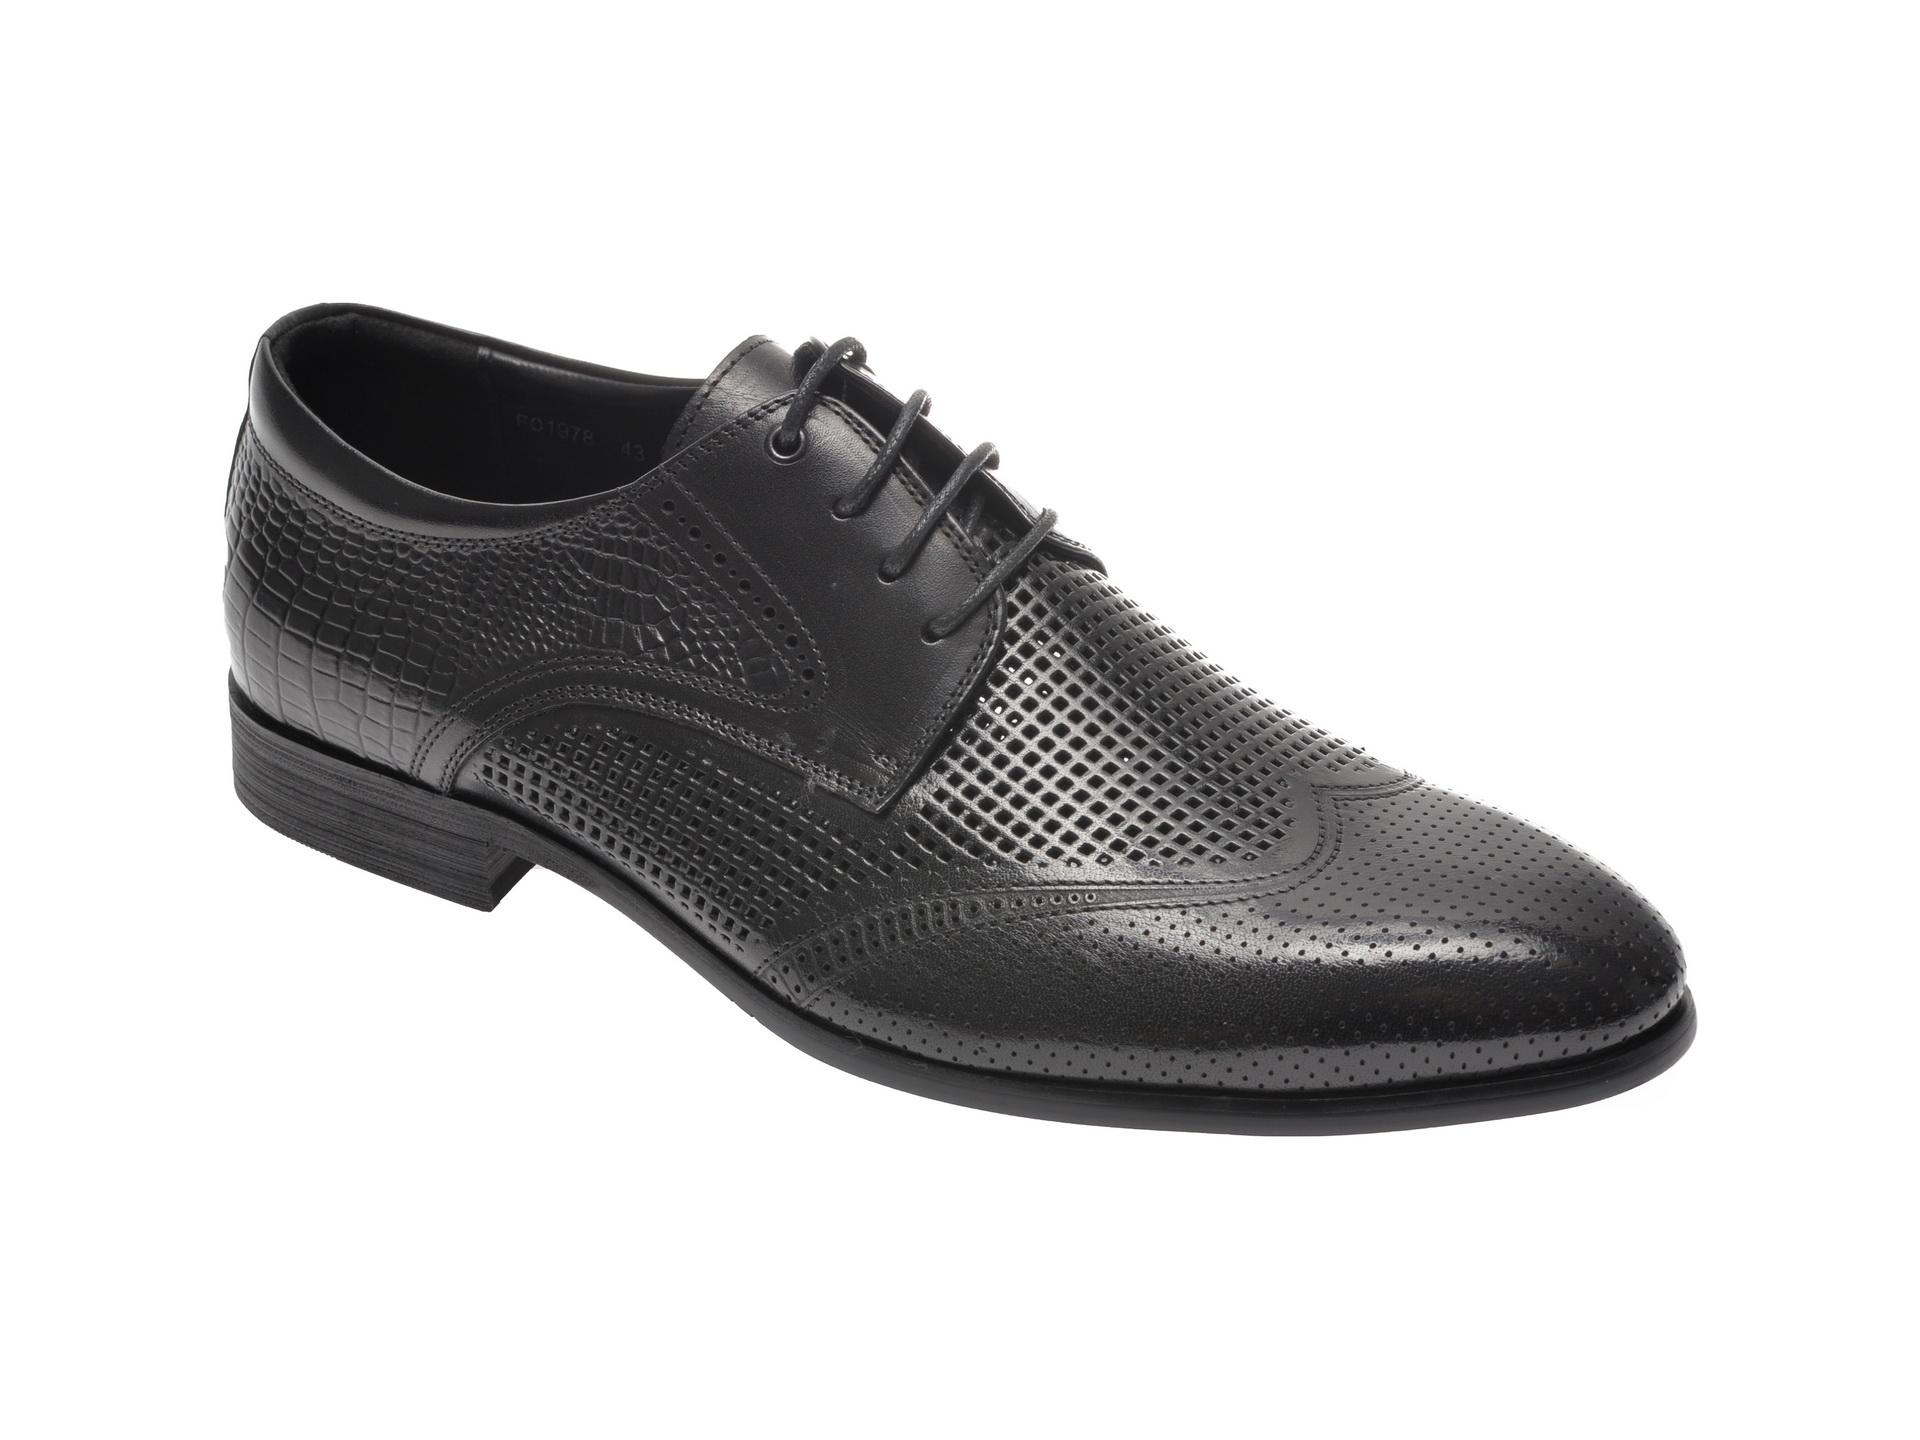 Pantofi OTTER negri, F01978, din piele naturala imagine